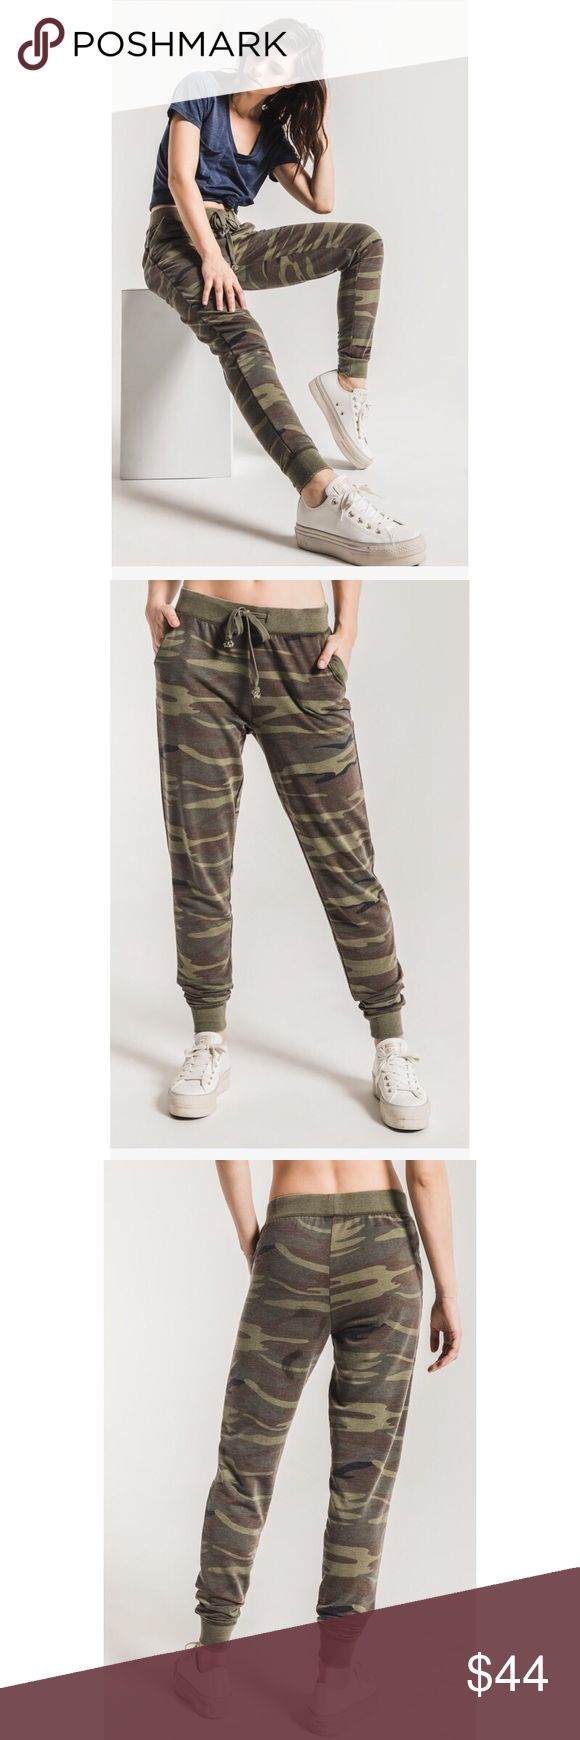 NWT  Z Supply camo jogger pant NWT Z Supply camo jogger pants! Green camo with pockets! Z Supply Pants Track Pants & Joggers